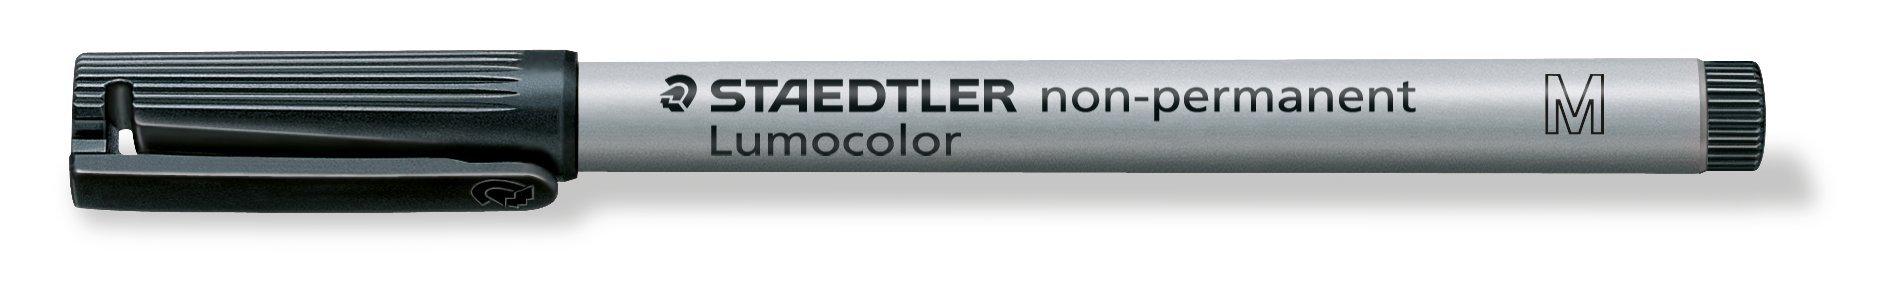 Staedtler 315-9 - Lumocolor Ohp Pen Non-Perm Med 0.8Mm Black 315 - (Pk10)